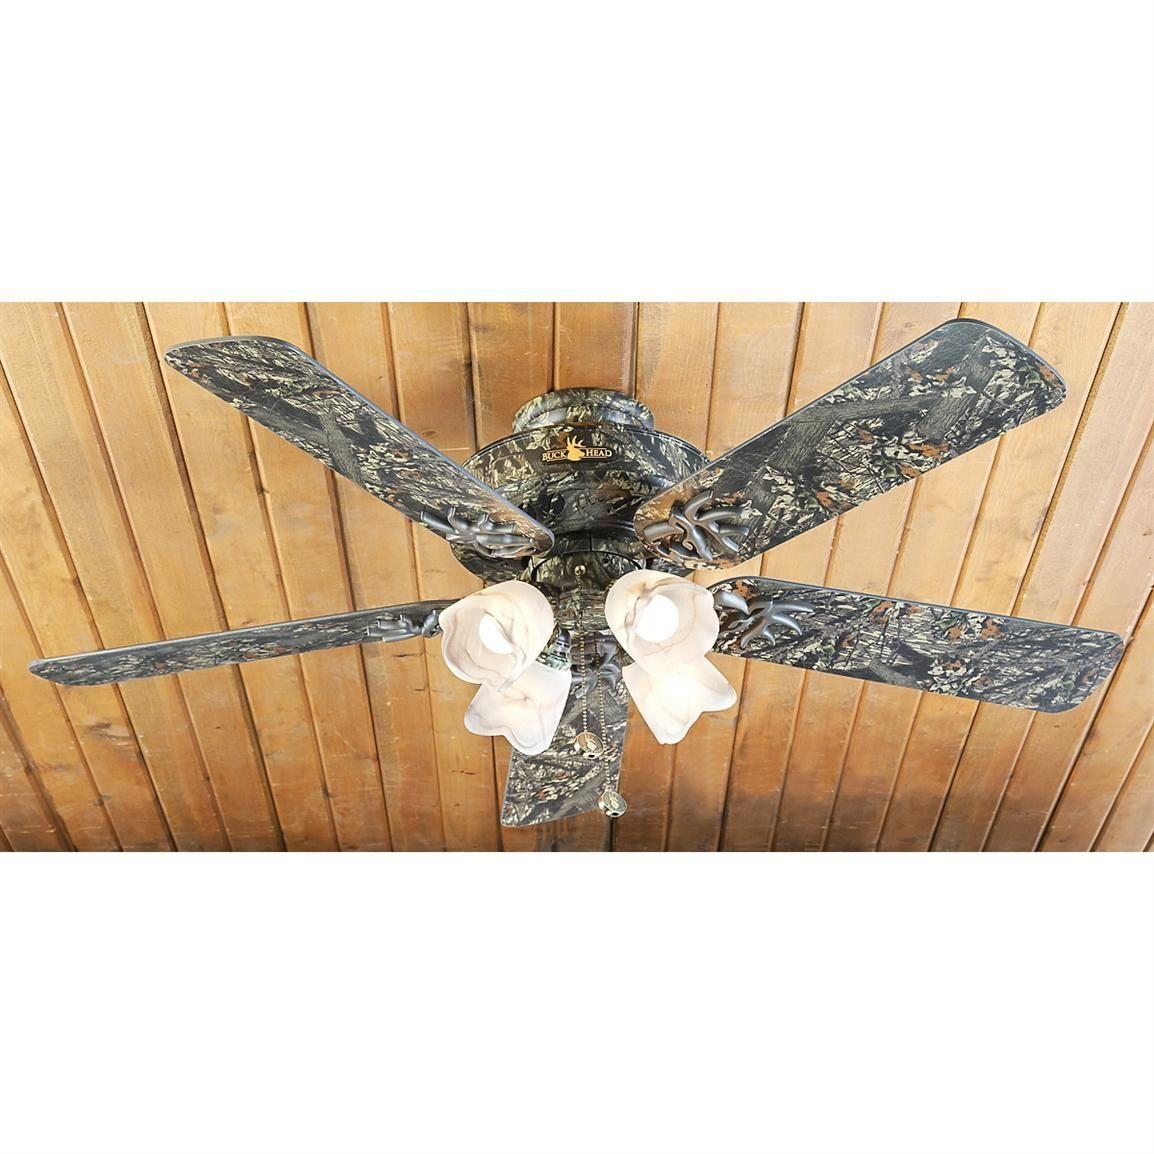 Mossy oak ceiling fans httpladysrofo pinterest mossy oak mossy oak ceiling fans aloadofball Image collections